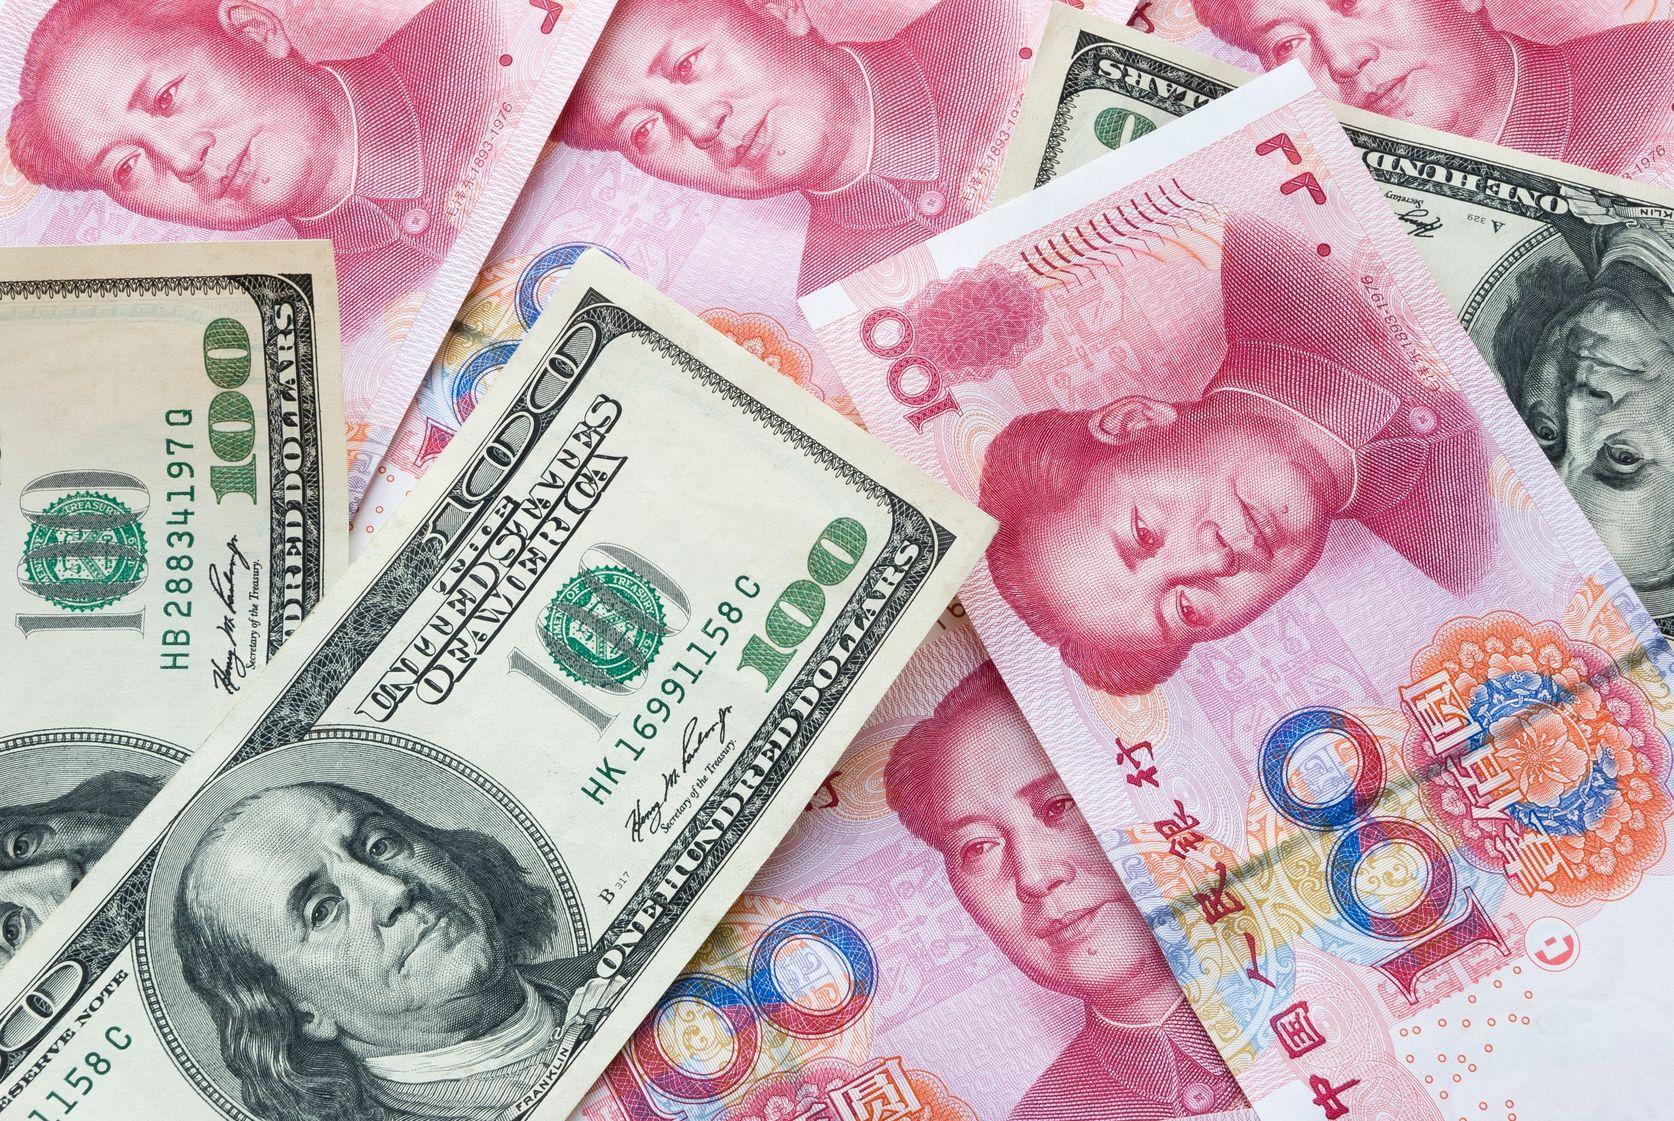 dollars, RMB, renminbi, Chinese currency